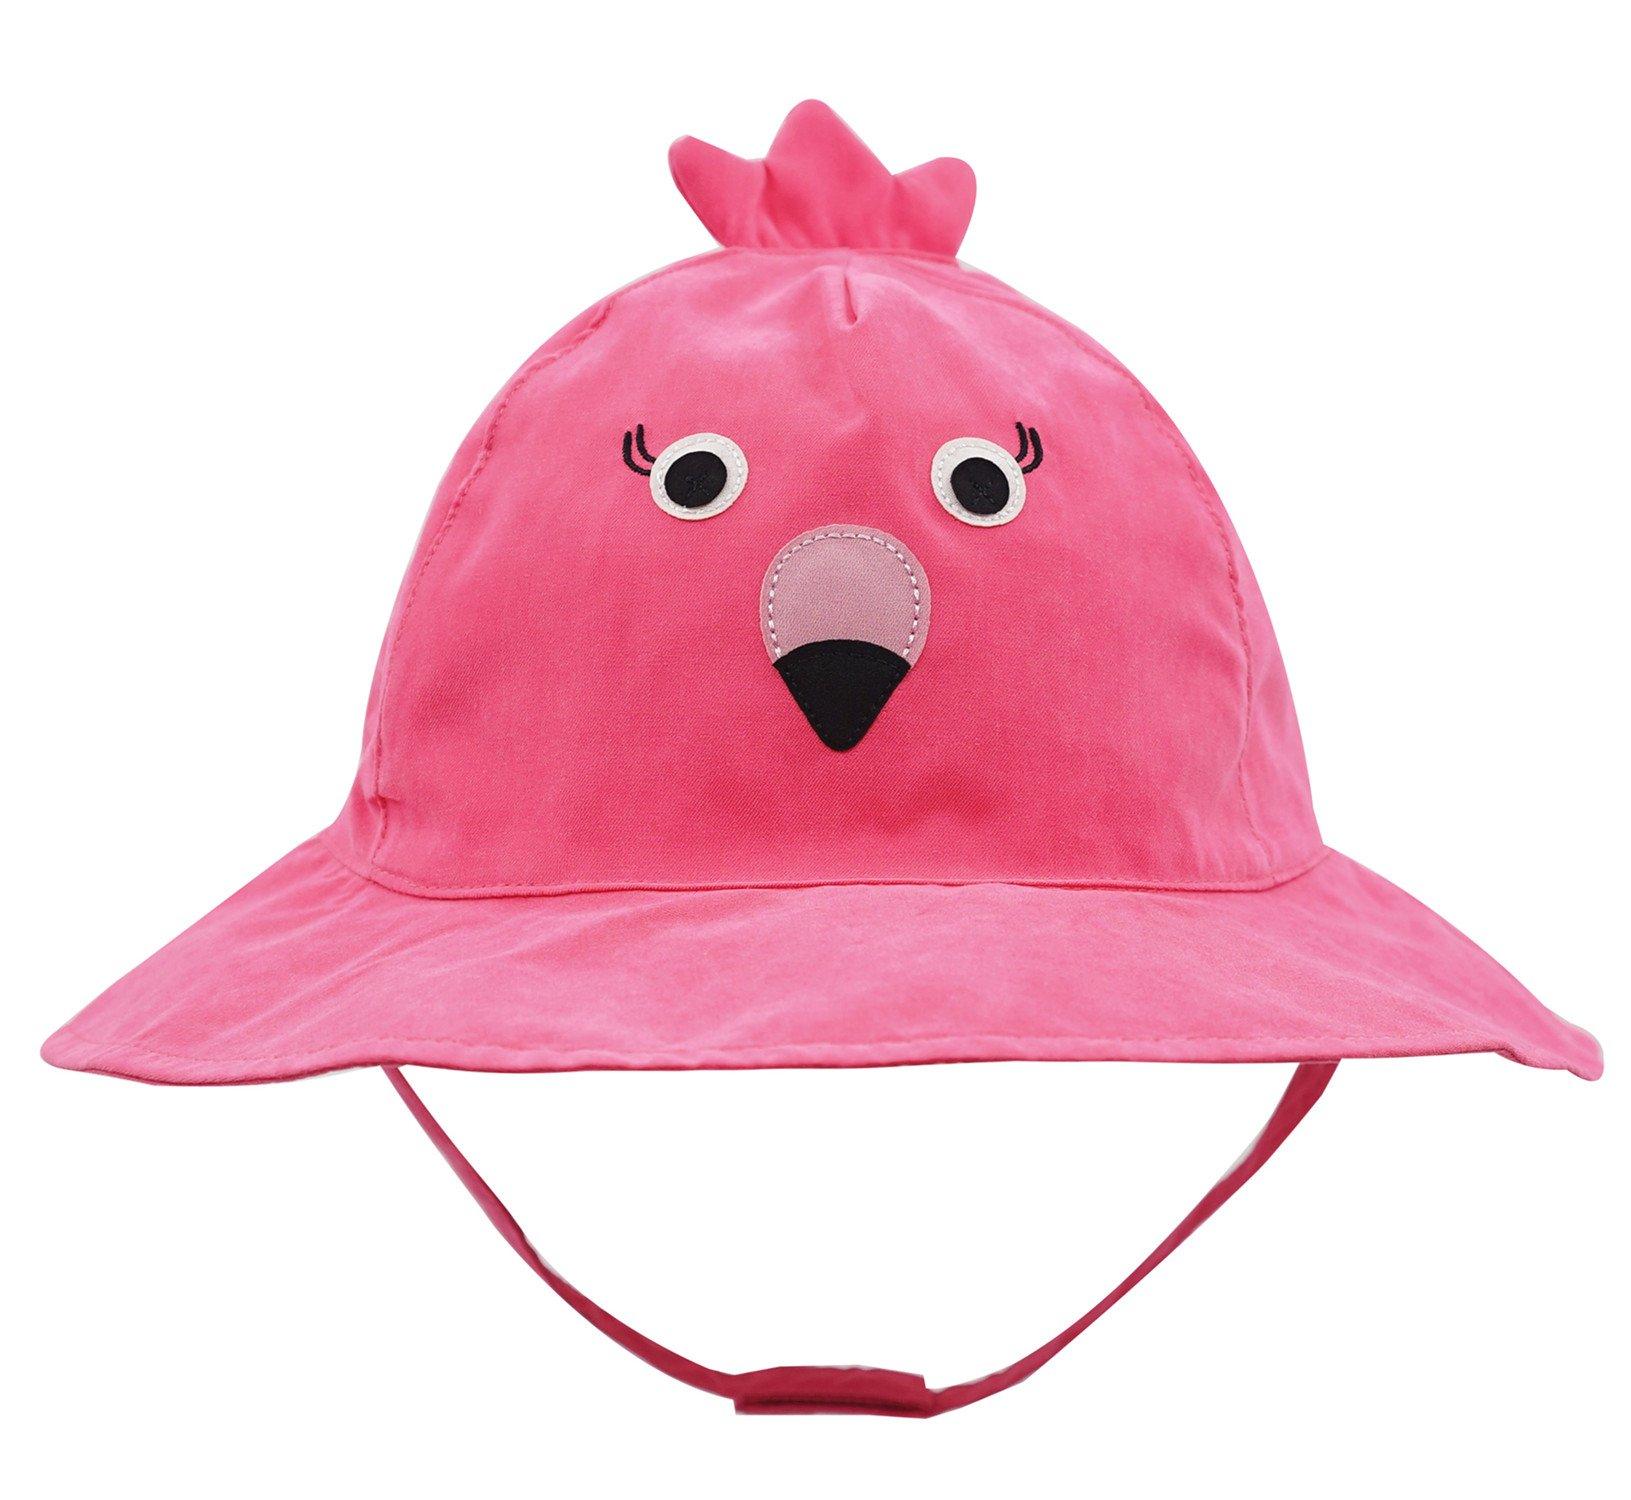 Connectyle Baby Infant Toddler Kids' UPF 50+ Sun Protection Hat Cute Cartoon Bucket Sun Hats